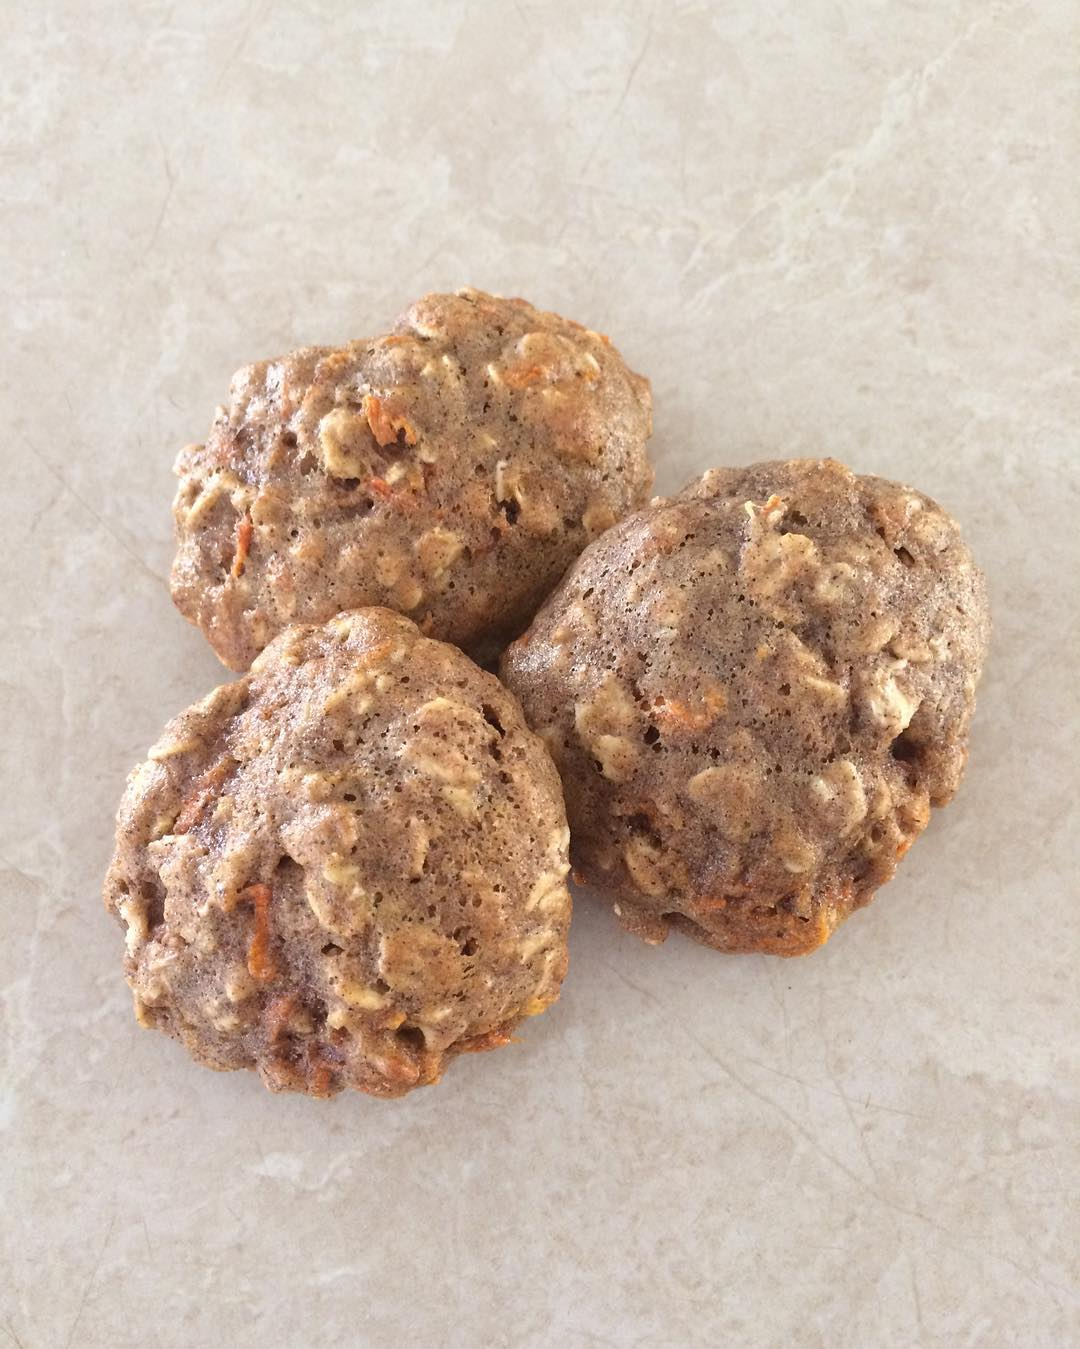 carrot cake oatmeal cookies by @lauz_waller